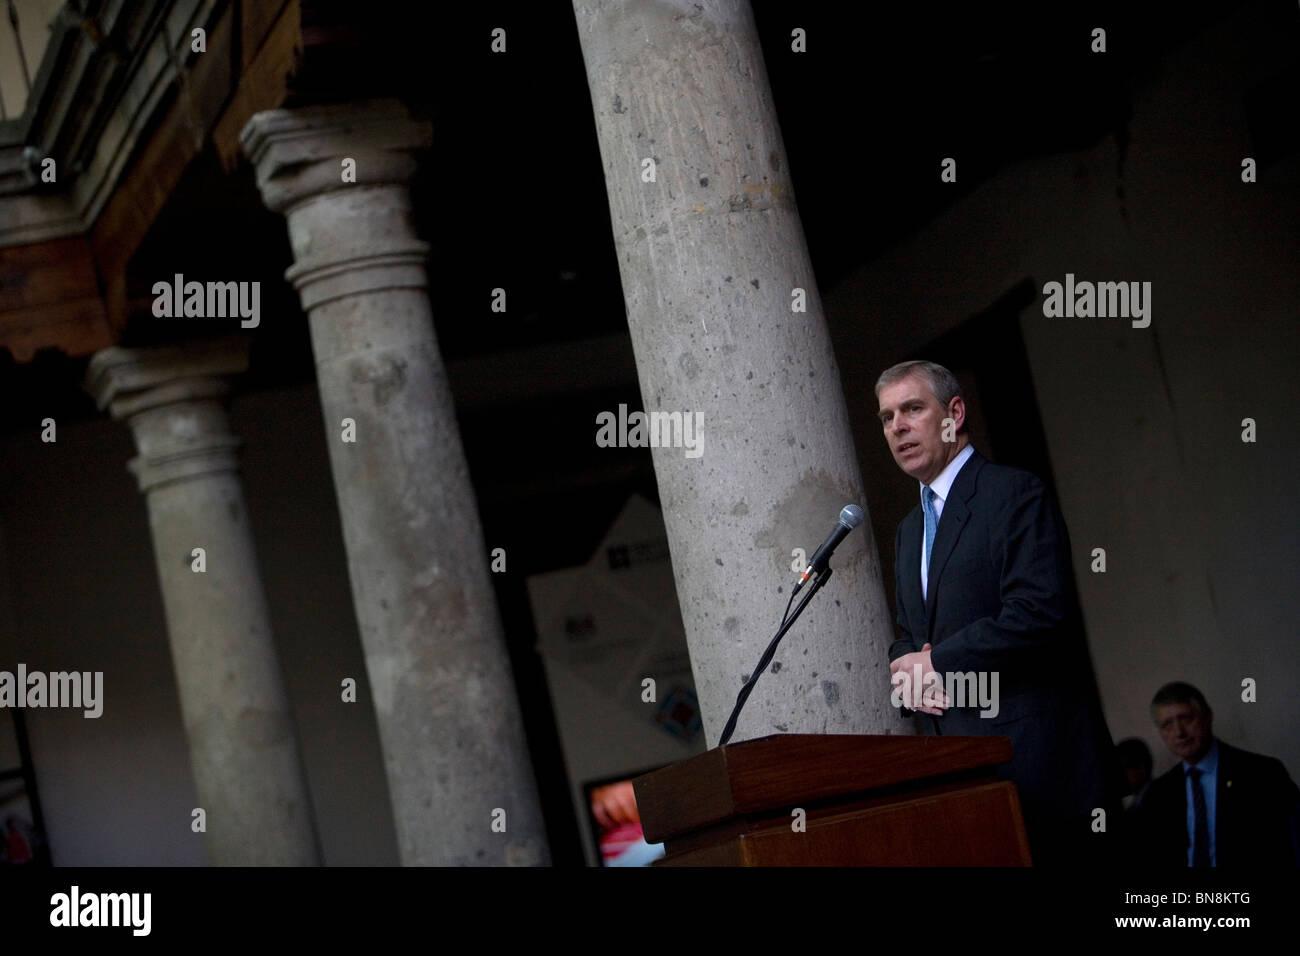 fascinat prince andrews speech - HD1300×956